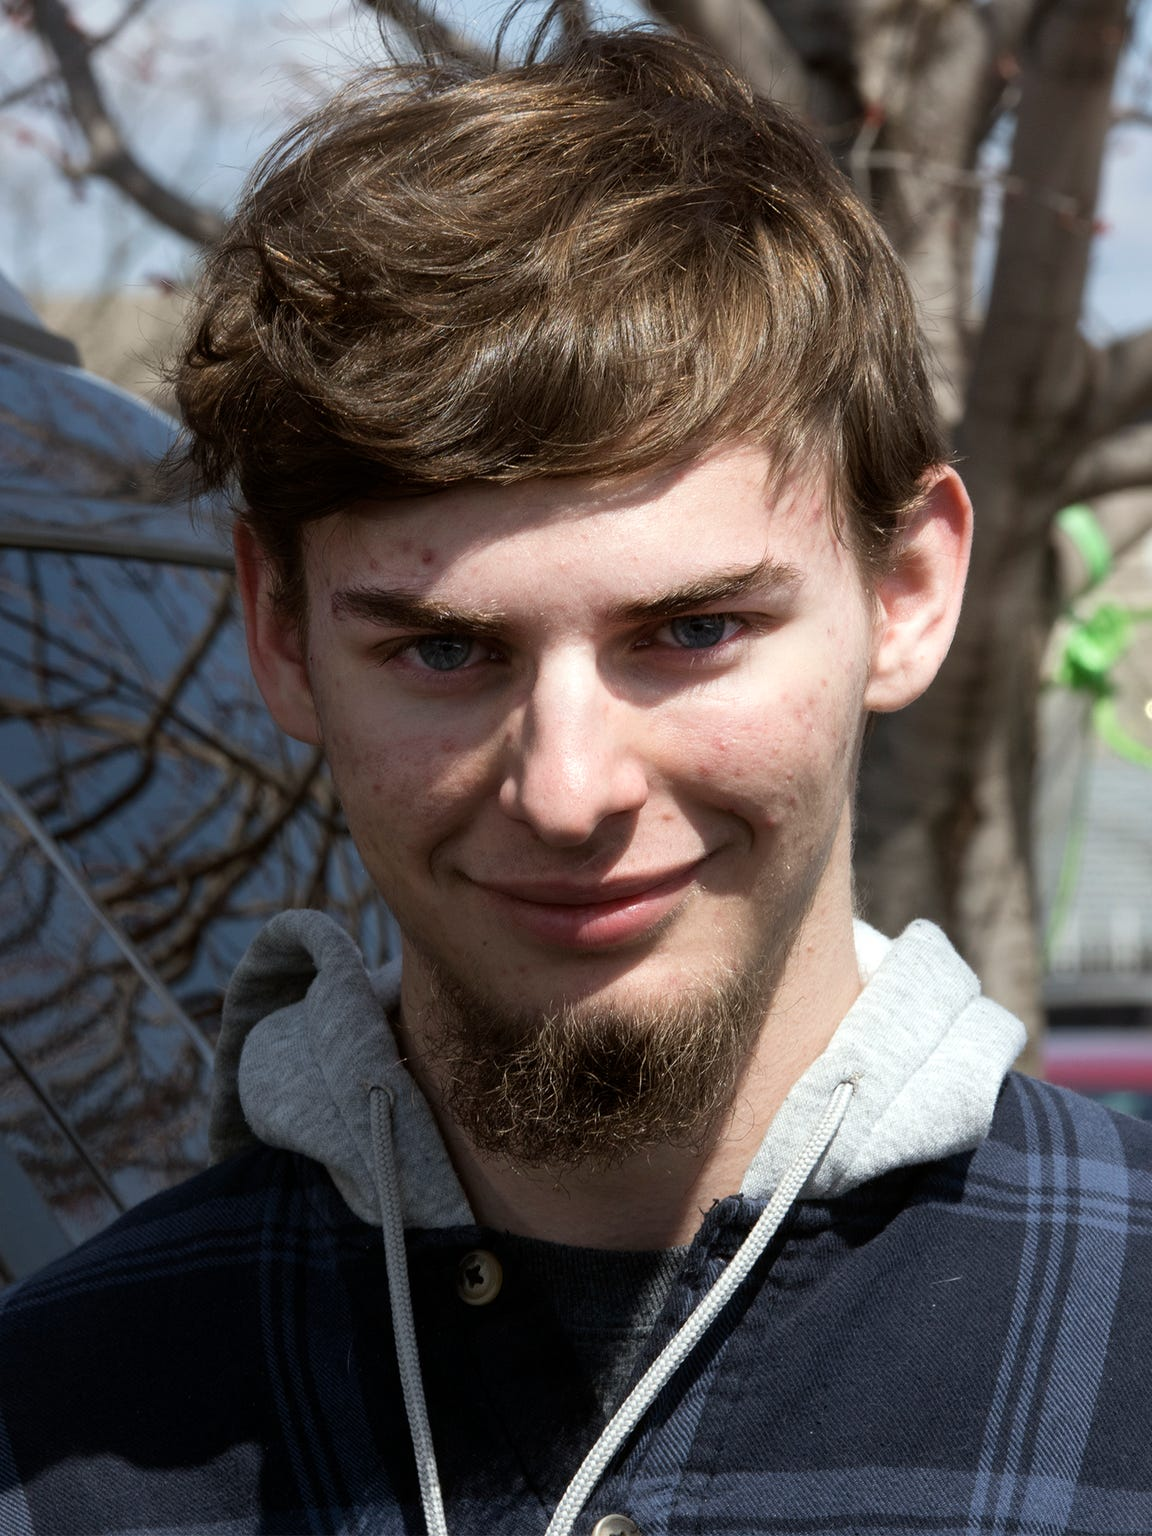 Dominick Hyatt, is a student at Chamberburg Area Senior High School.